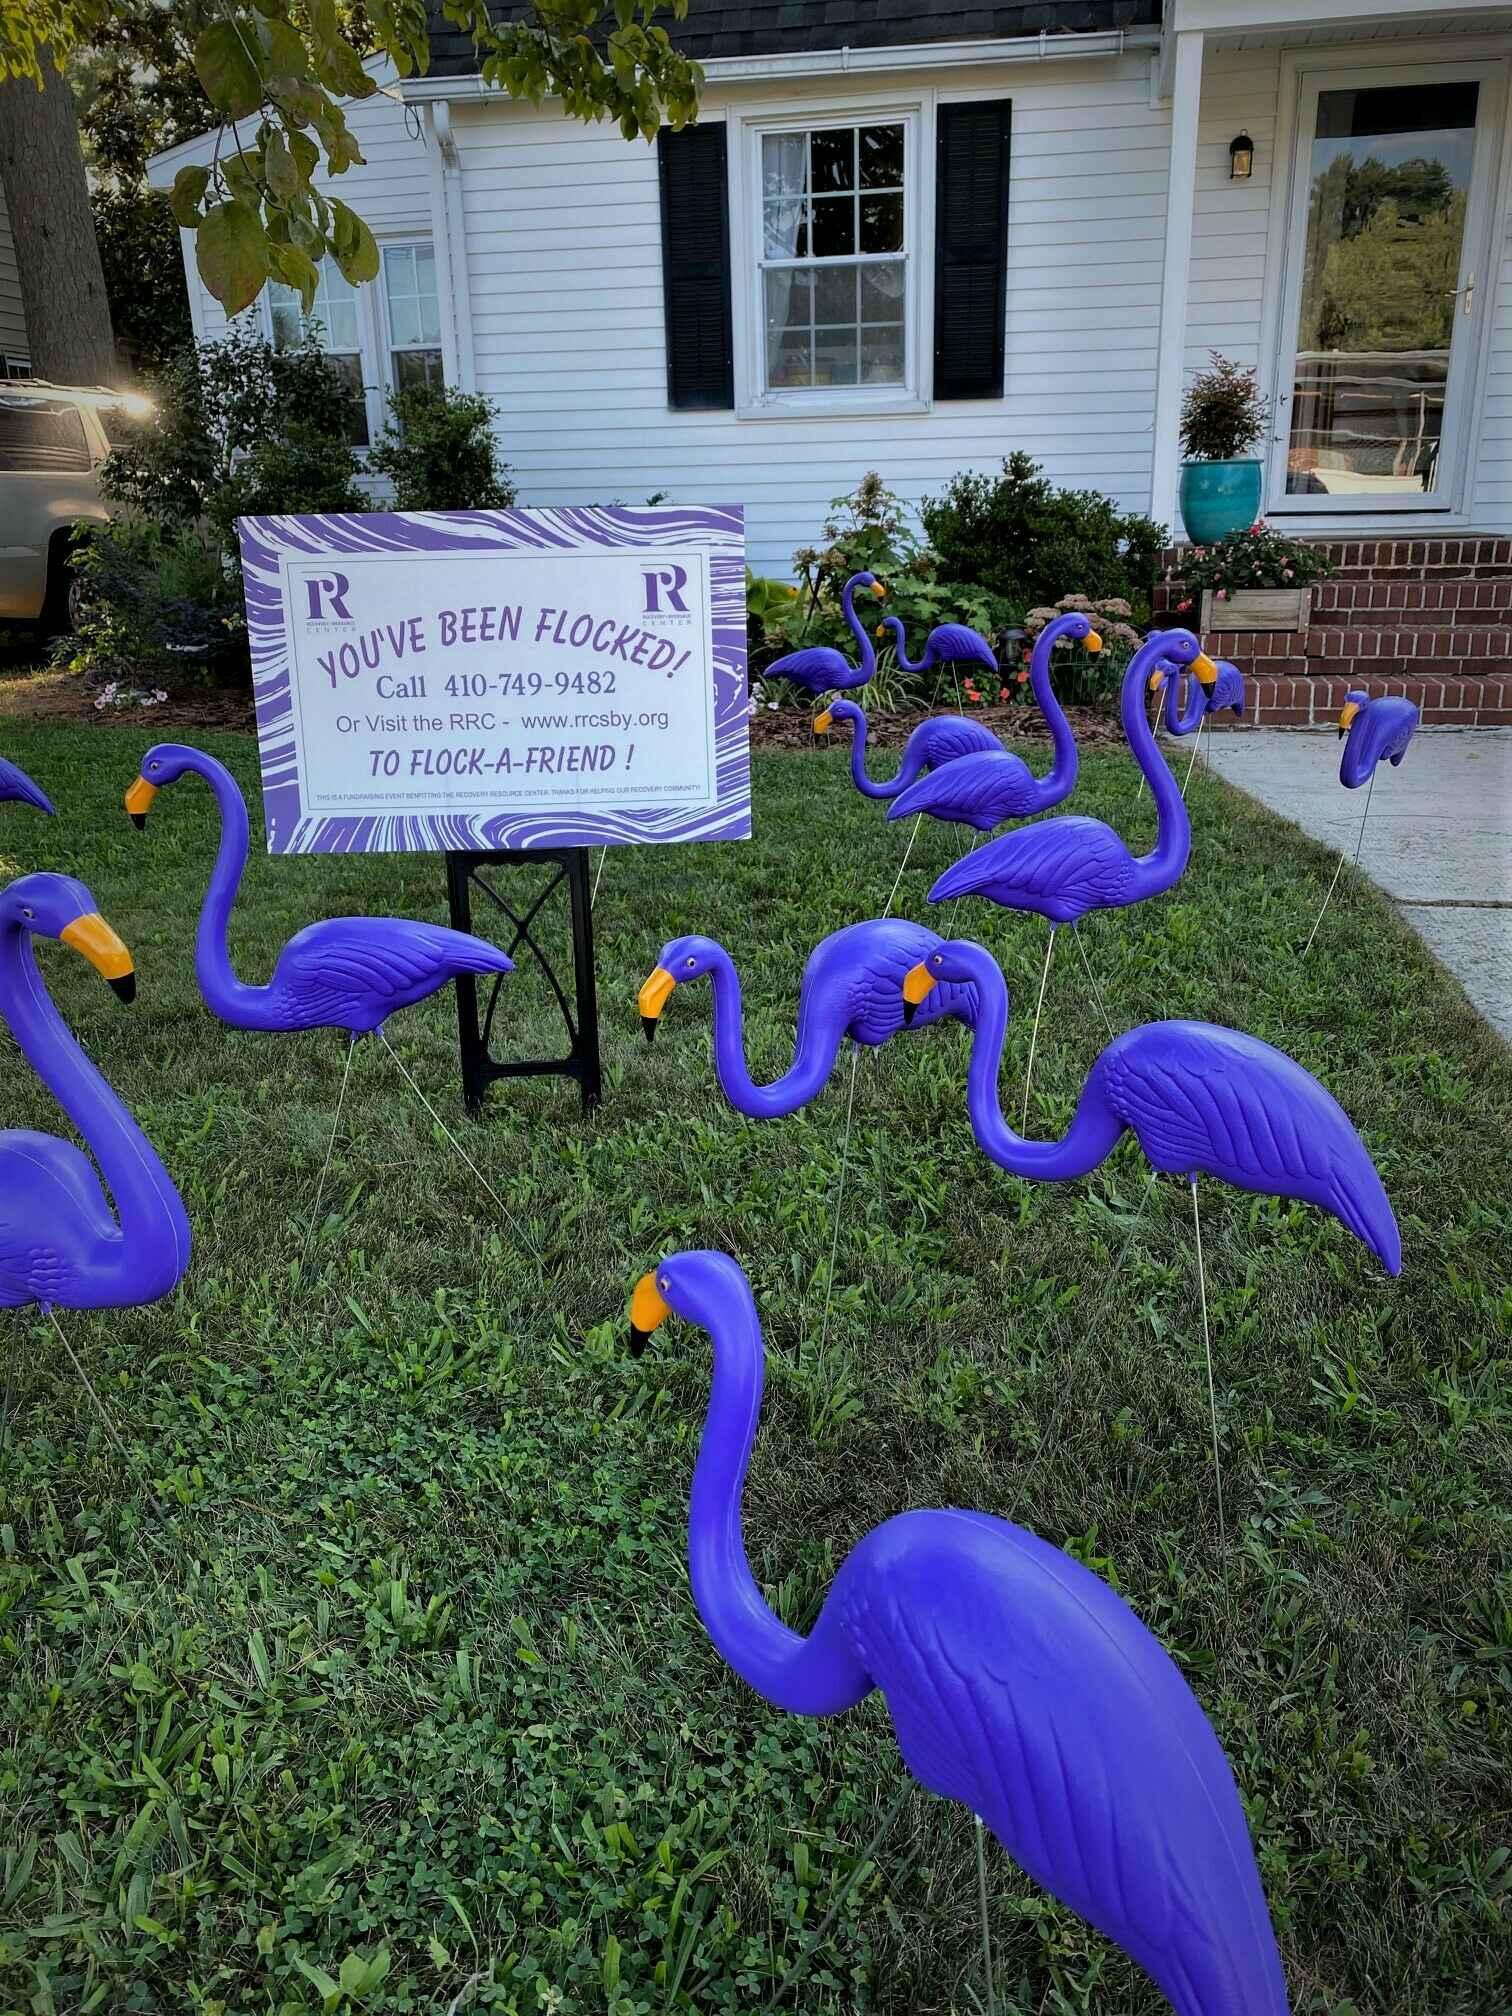 Flamingo Flock Fundraiser image